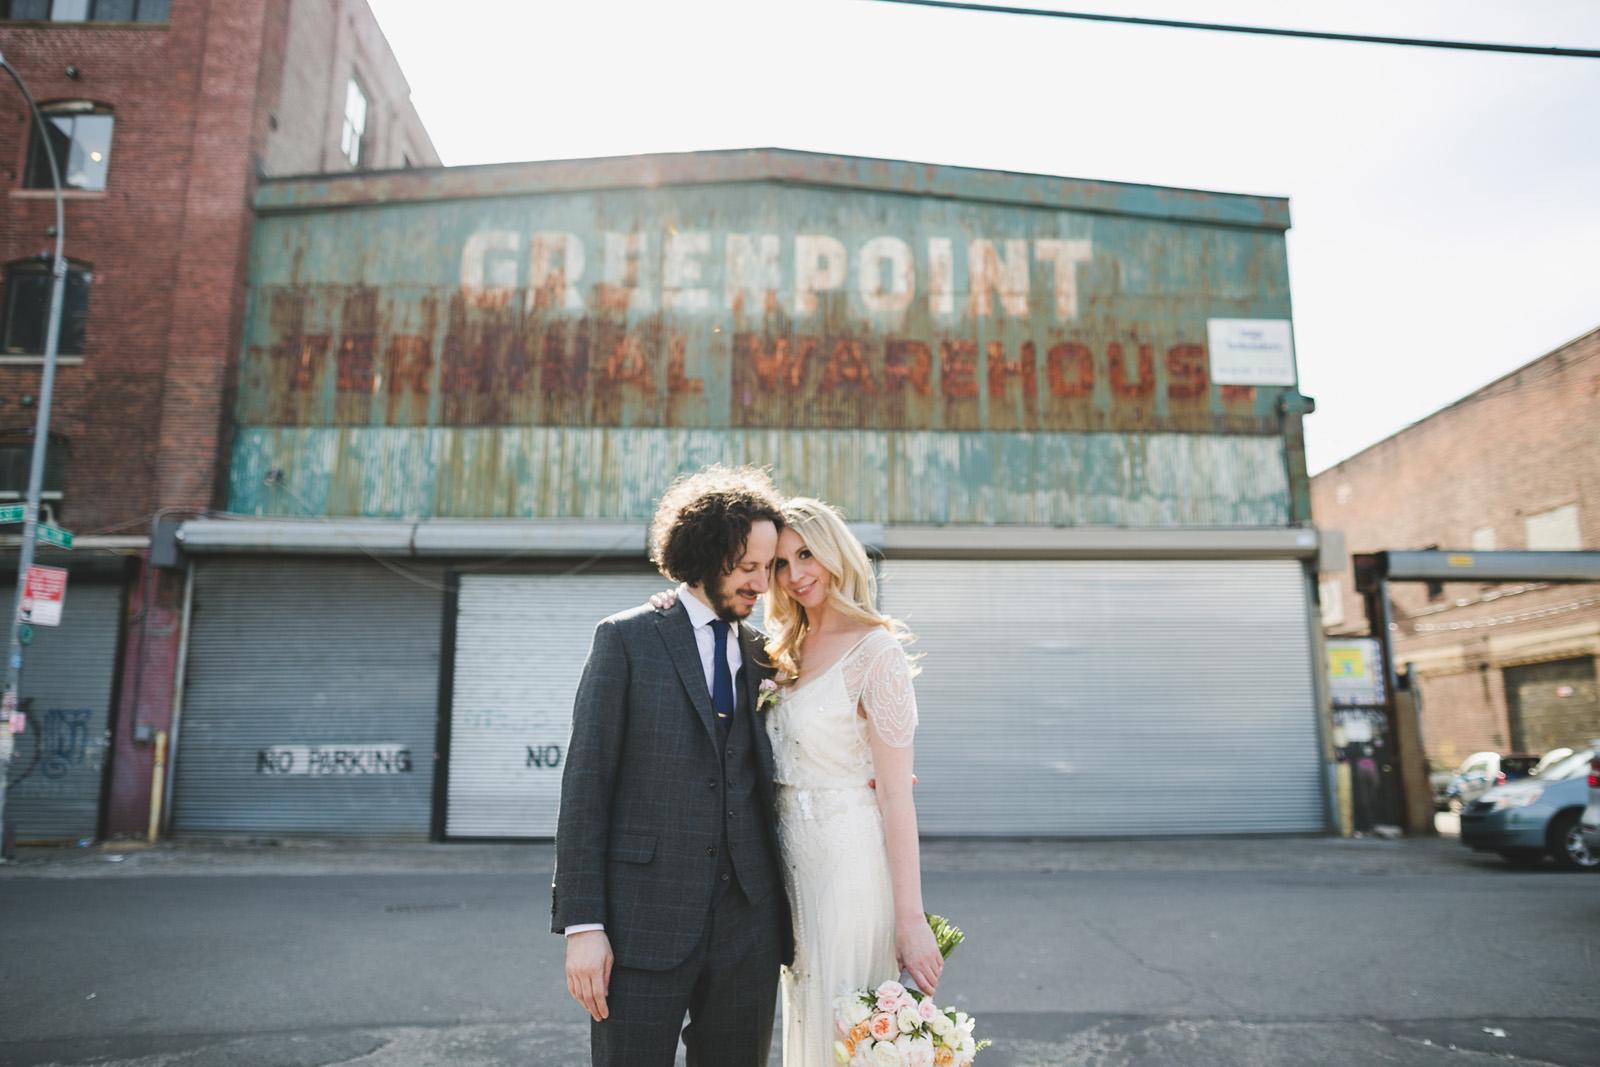 greenpoint brooklyn wedding photo, vintage sign, urban wedding photos